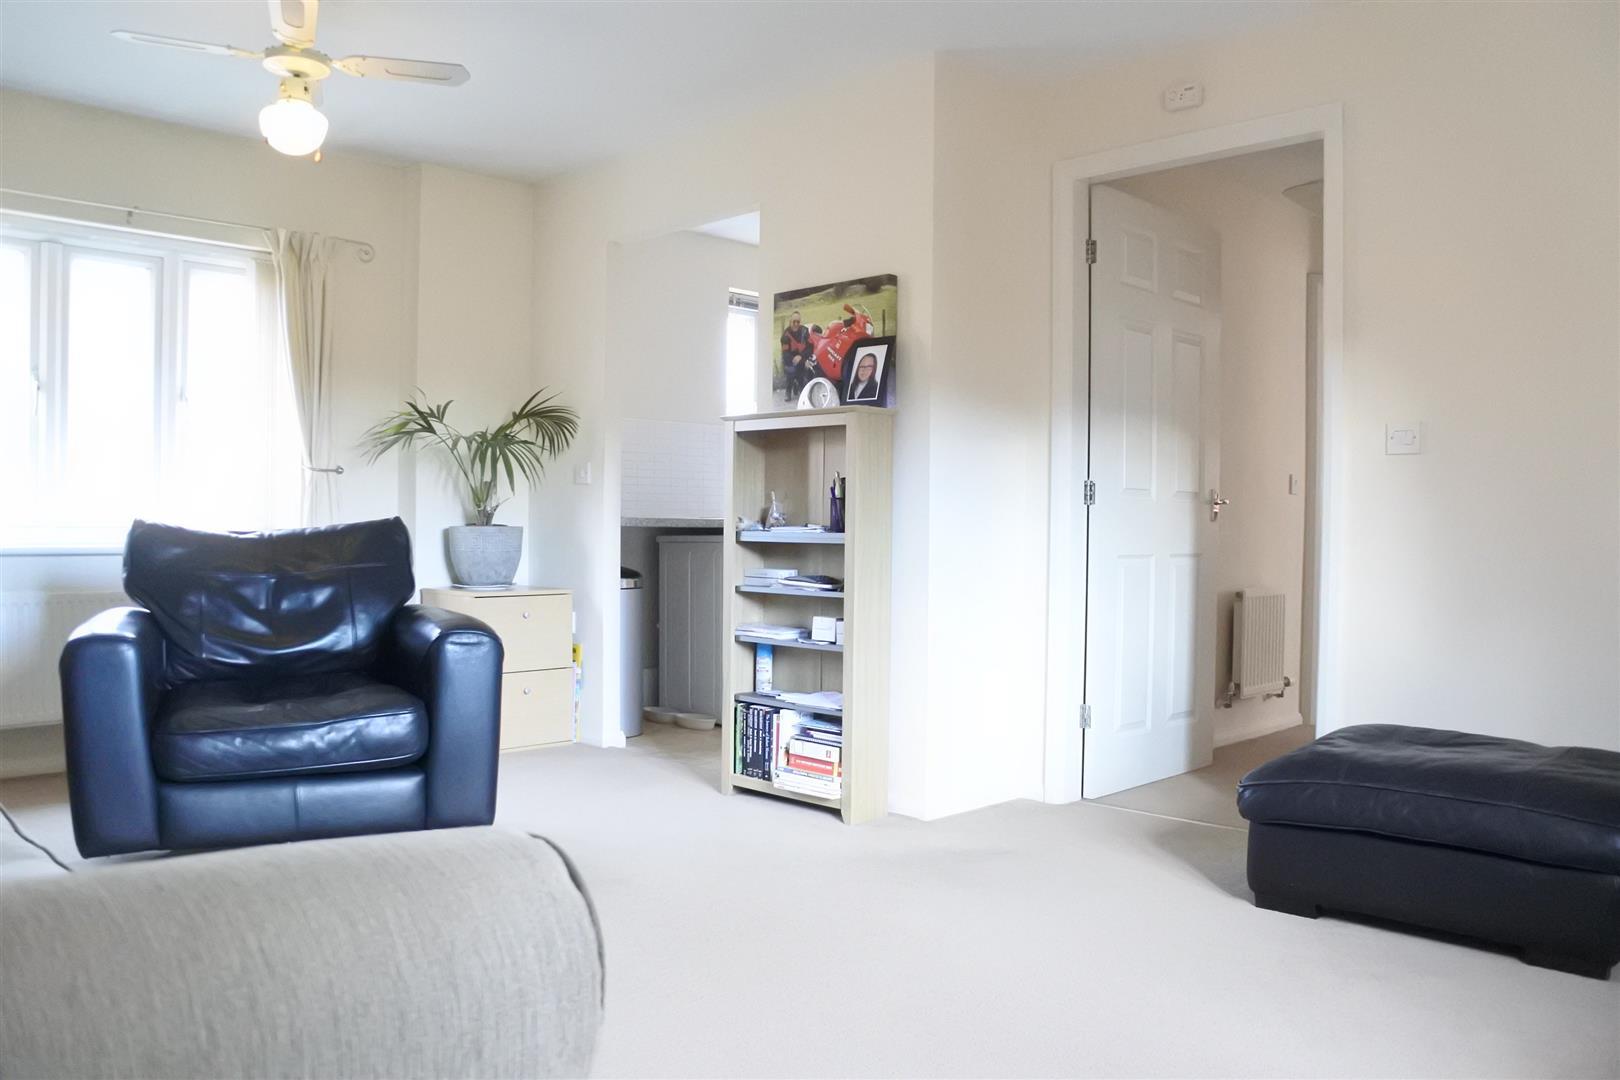 2 Bedroom Flat For Sale Ormonde Close Grantham Ng Ng31